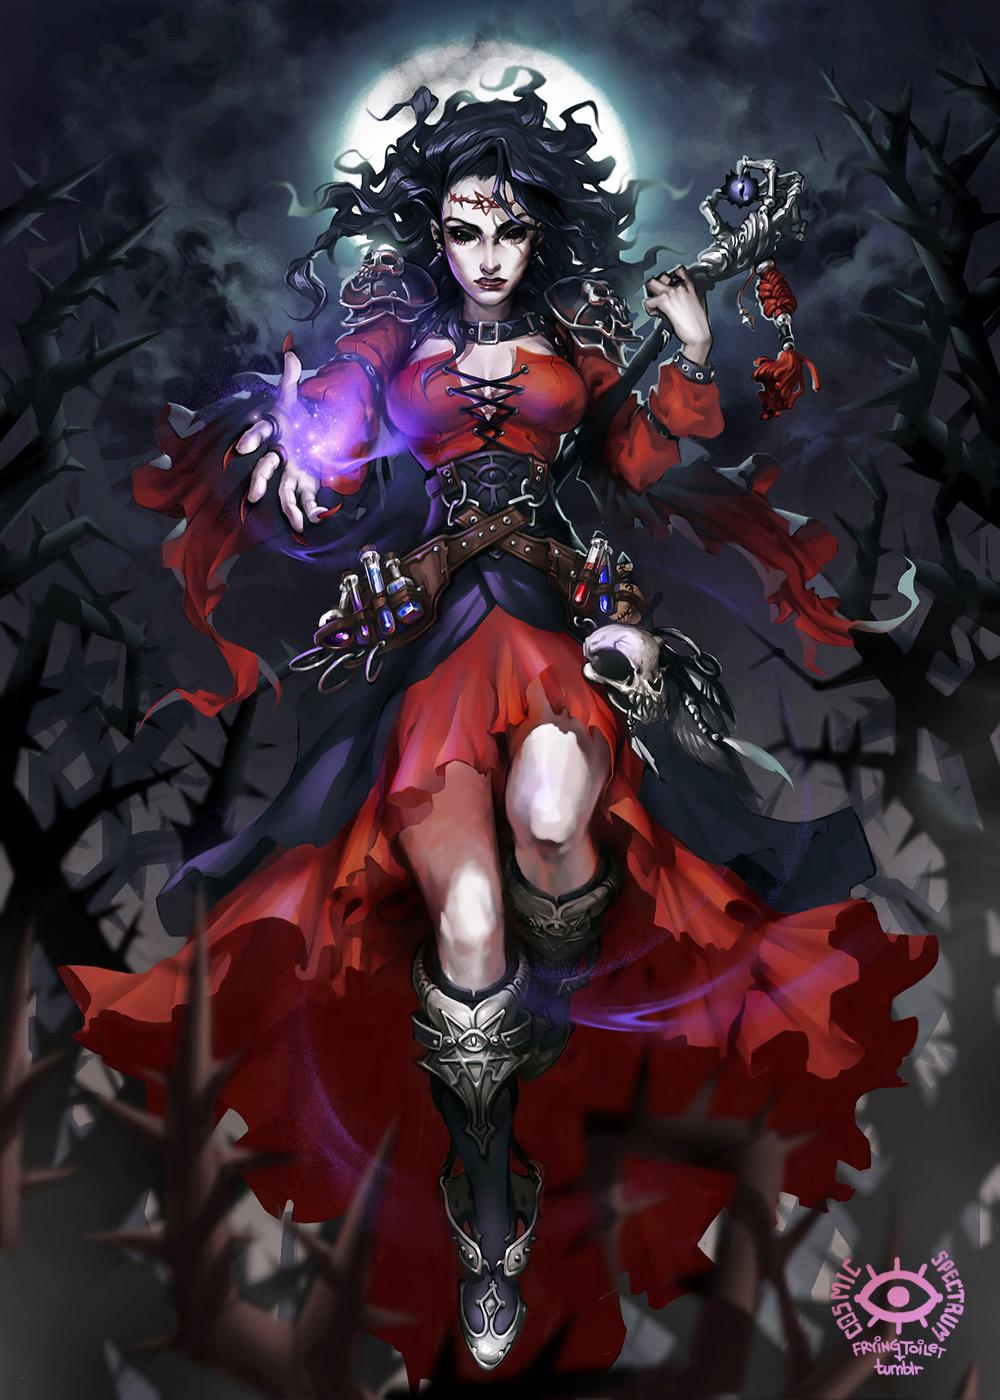 Galeria de Arte: Ficção & Fantasia 1 - Página 4 Titans__ghalos_witch_by_cosmicspectrumm-d7vyaoo